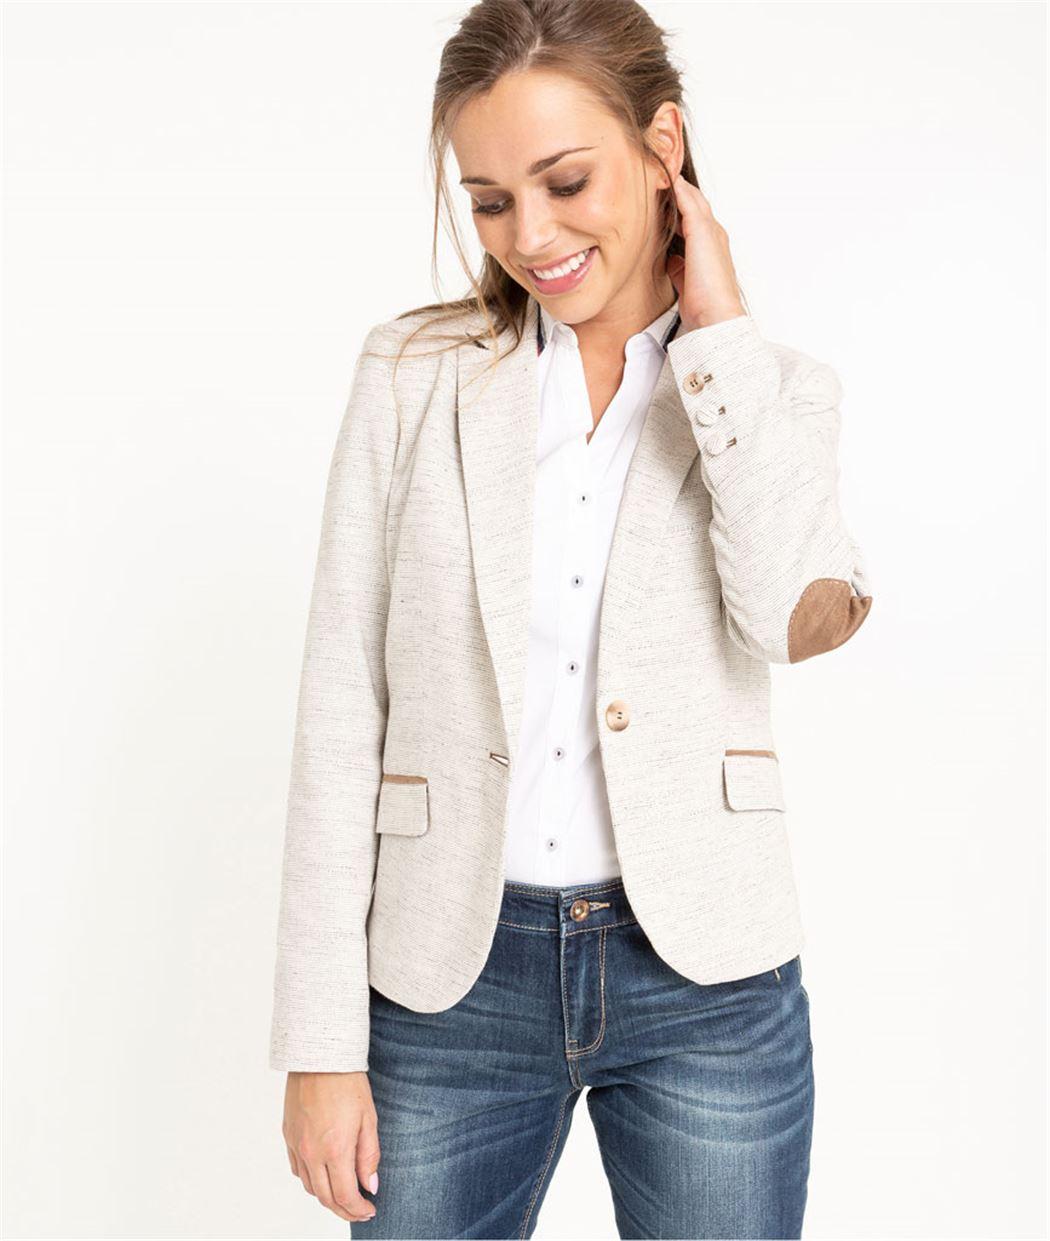 Veste blazer femme en coton BEIGE